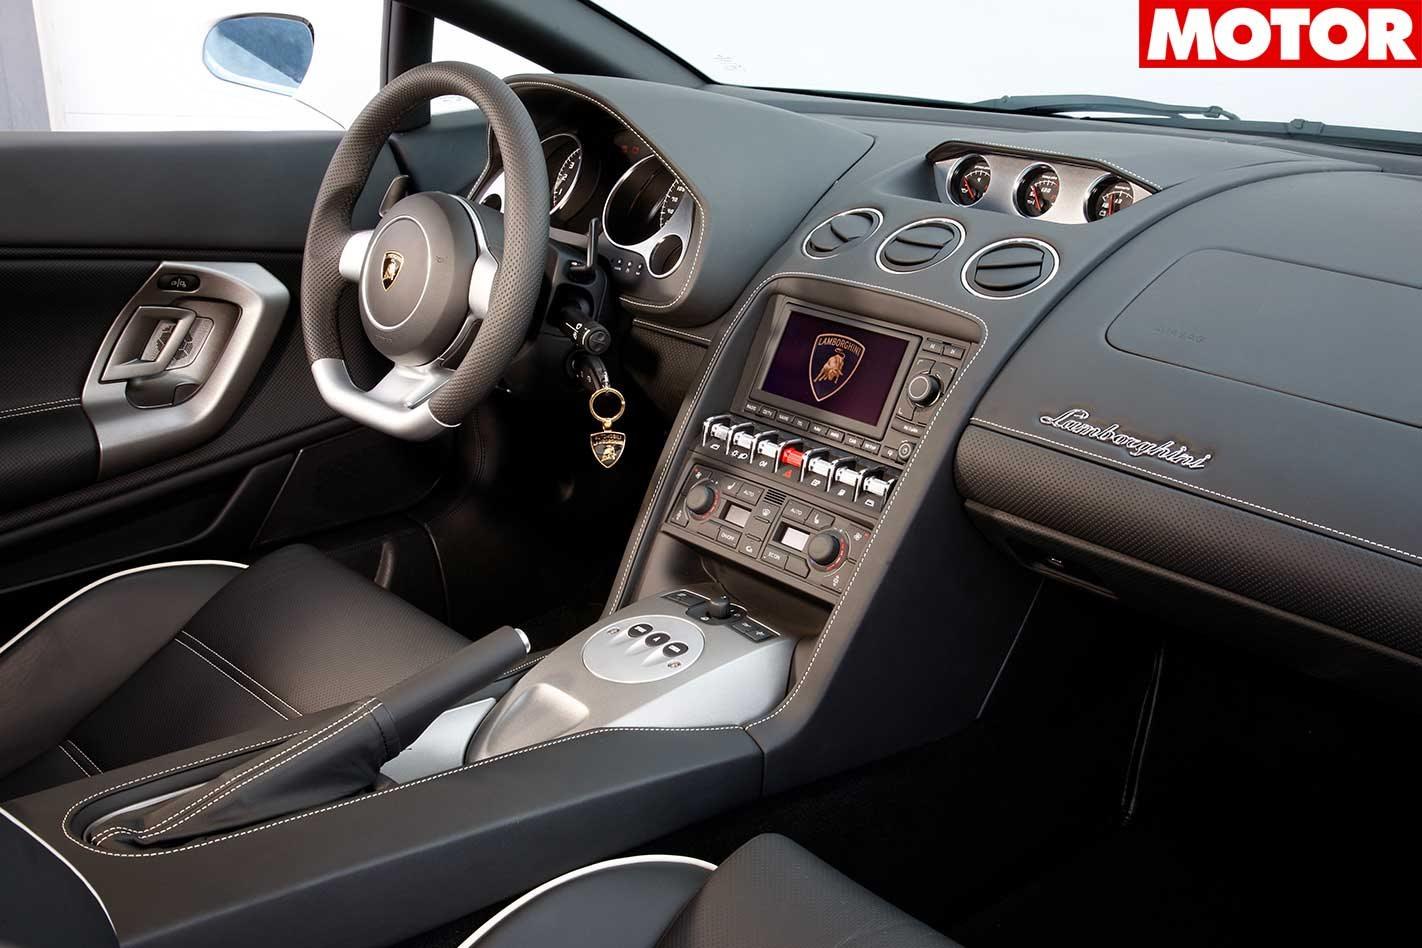 2008 Lamborghini Gallardo Lp560 4 First Drive Classic Motor